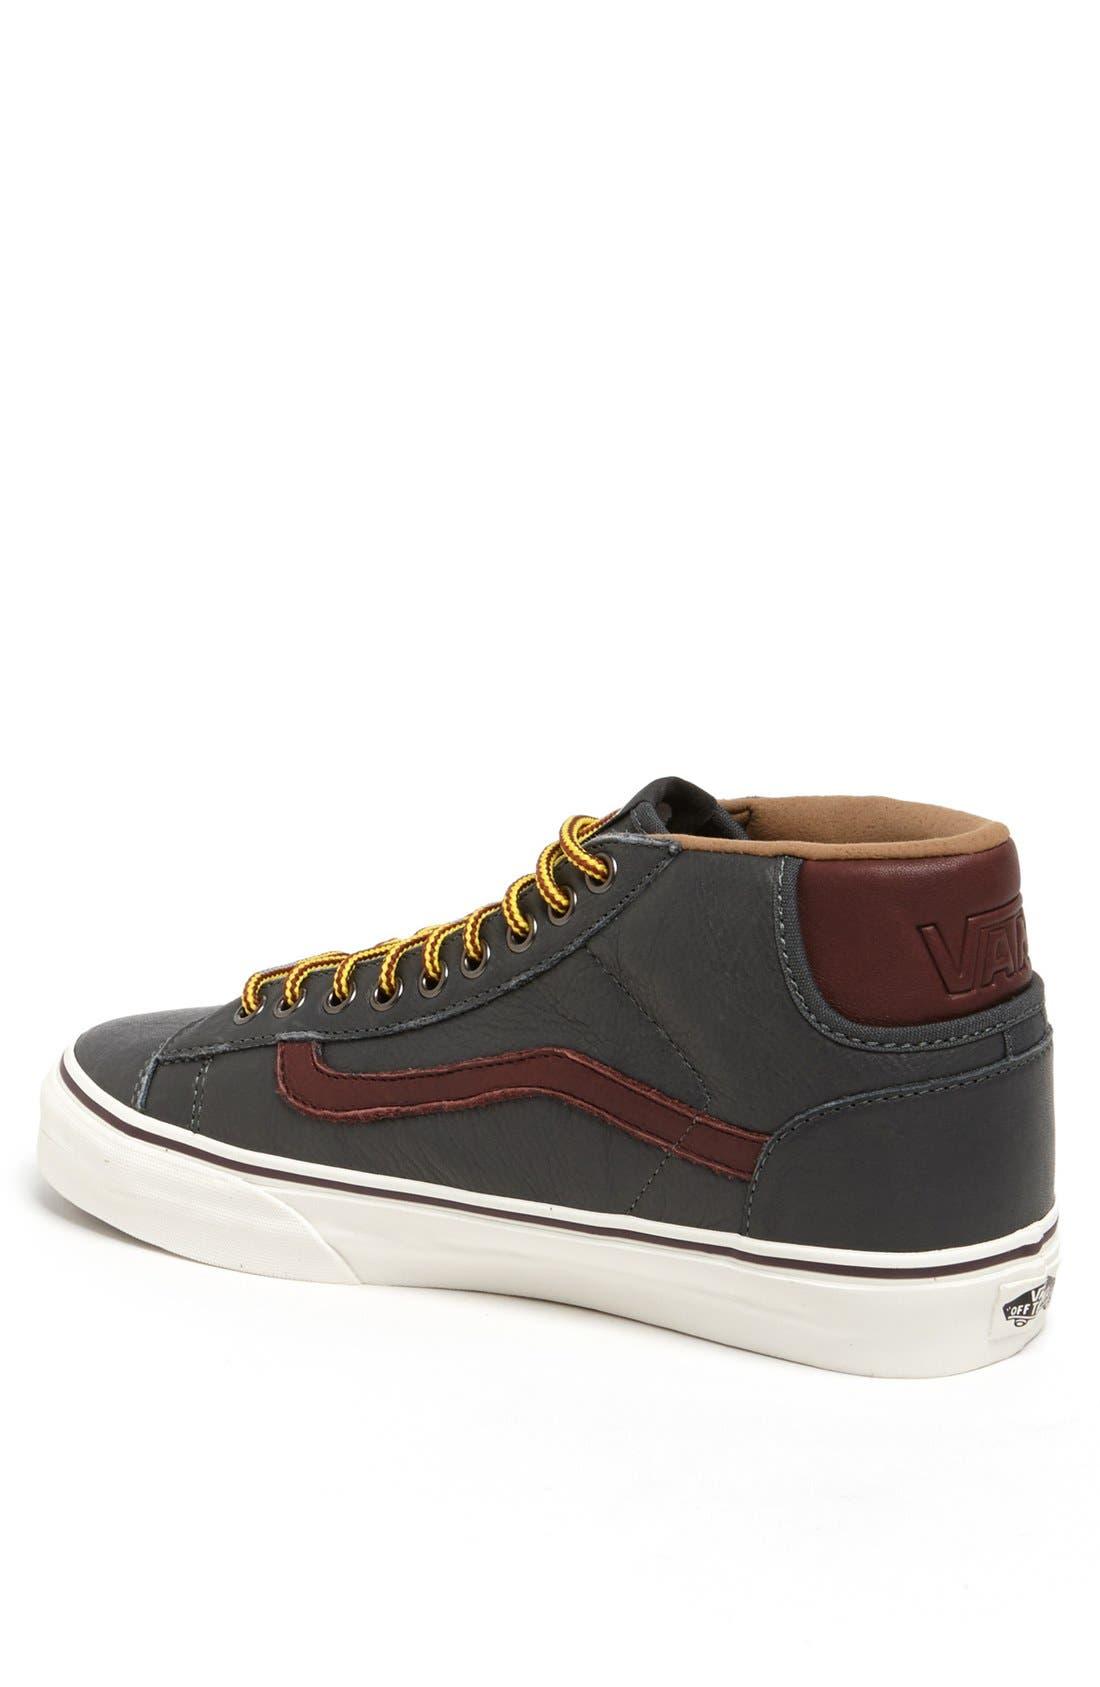 'Mid Skool 77' Sneaker,                             Alternate thumbnail 2, color,                             001